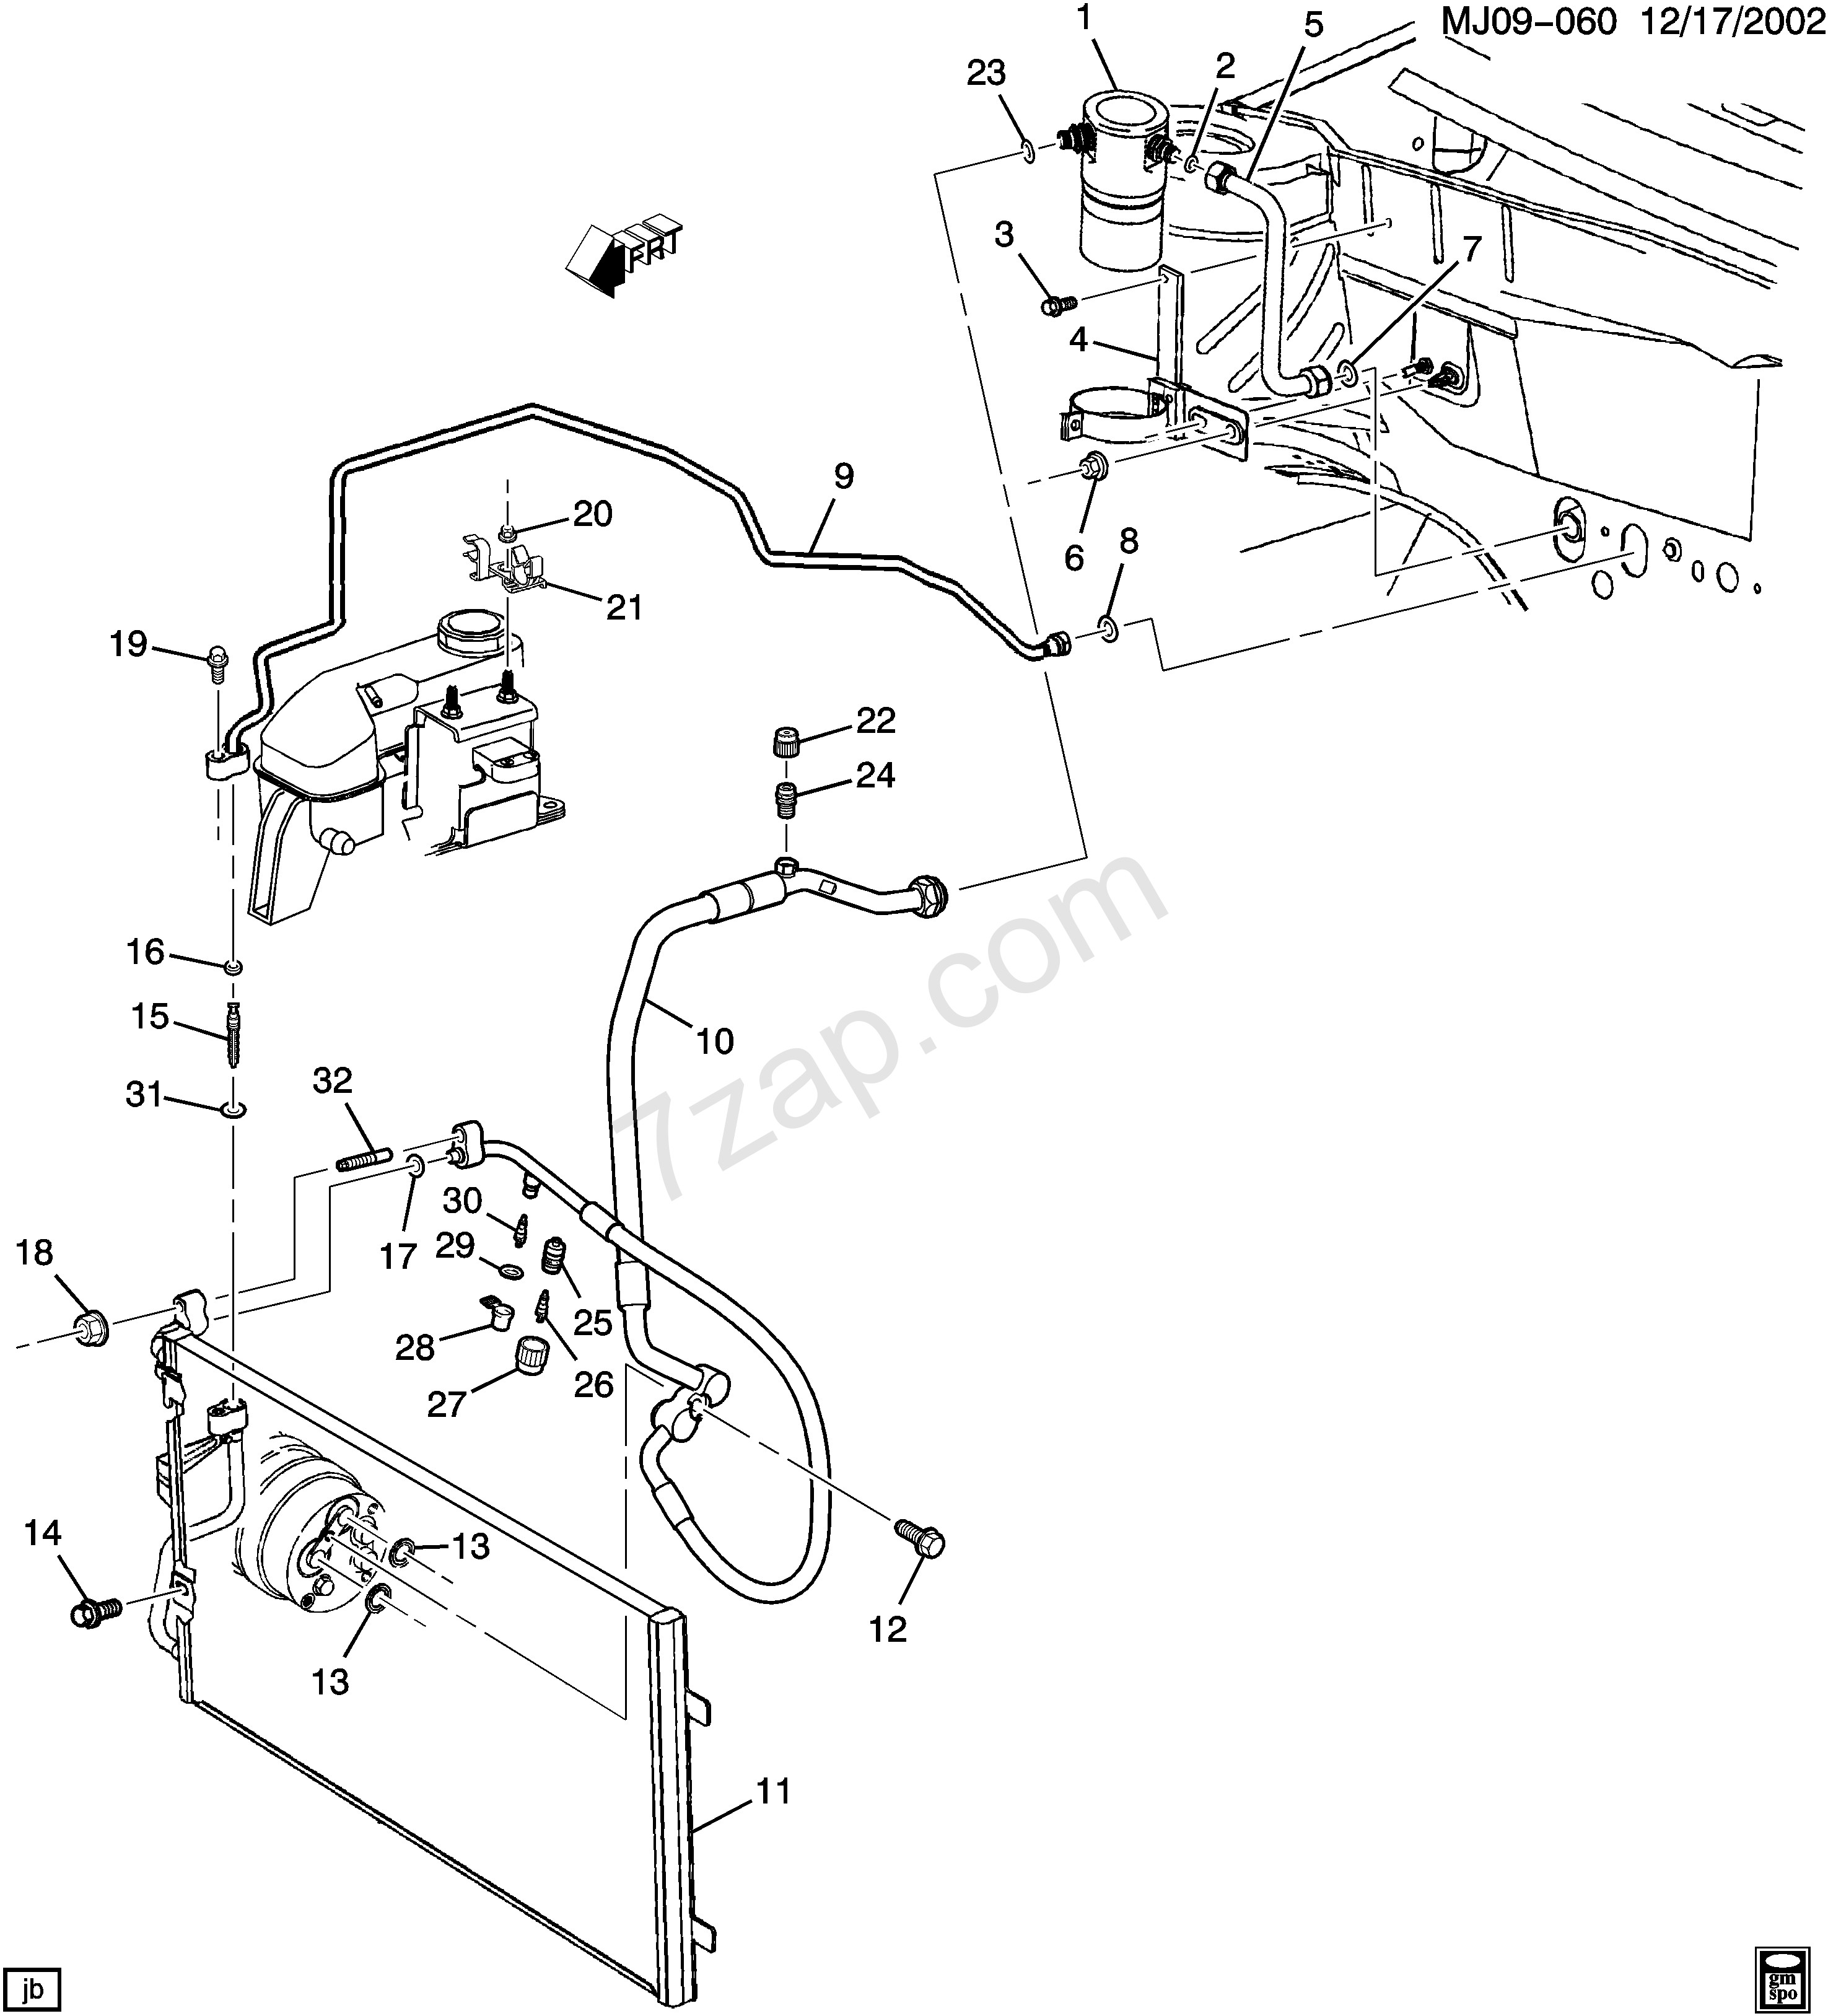 2002 Chevy Cavalier Engine Diagram 1996 1997 J A C Refrigeration System Ln2 2 2 4 C60 Of 2002 Chevy Cavalier Engine Diagram